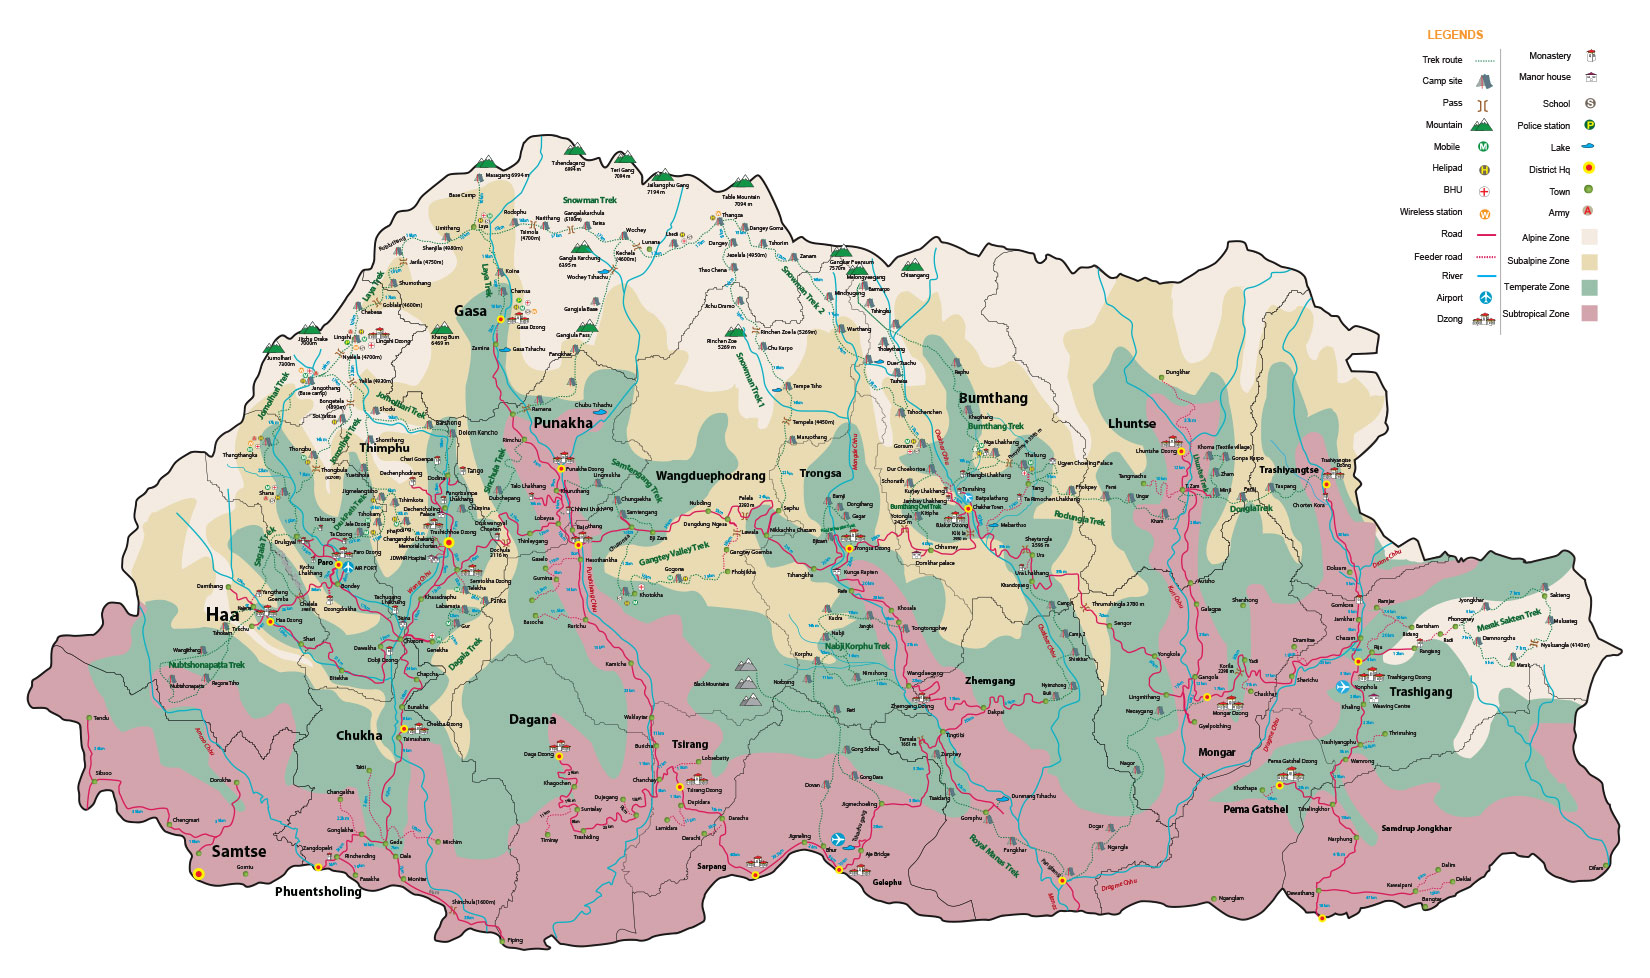 Bhutan Far East Bhutan Footprints Travel - Map of bhutan with districts